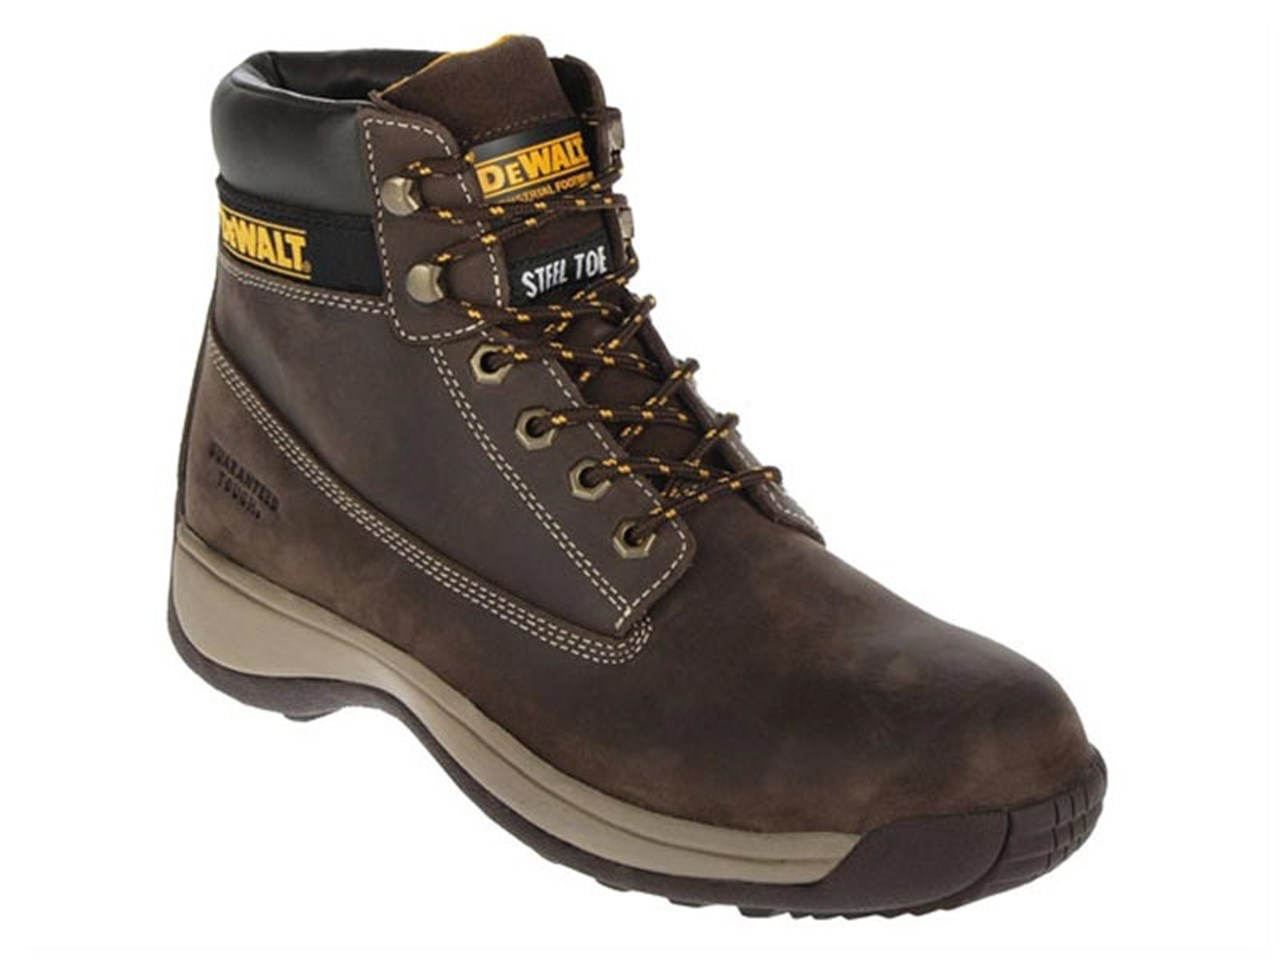 34bd722e621961 DeWalt DWF-60011-104 Apprentice Brown Nubuck Boots Size 8 - 42